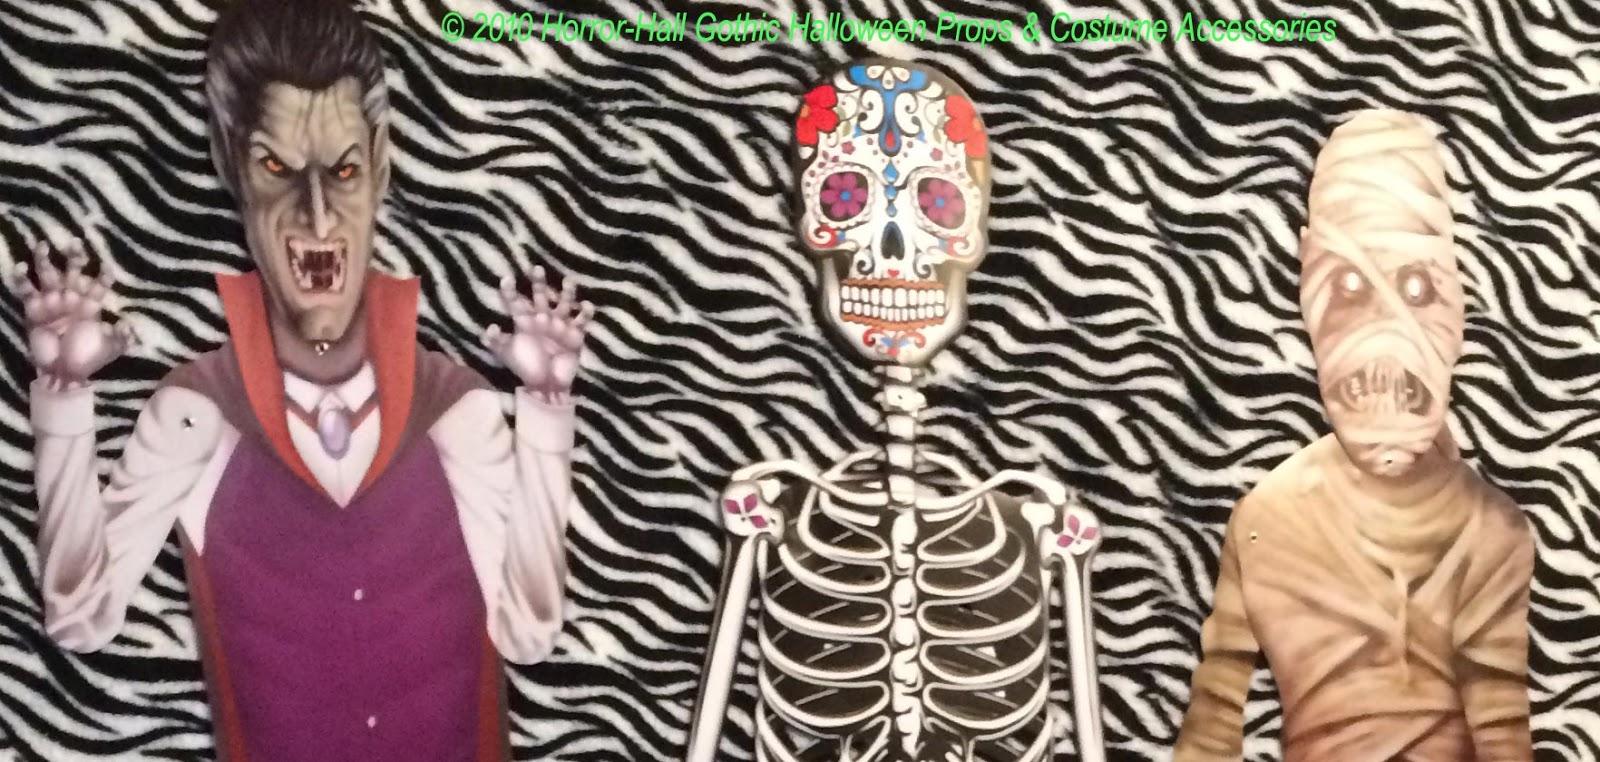 Luau decoration 24 real raffia deck fringe garland tropical tiki bar - Horror Hall Gothic Cheap Halloween Props And Costume